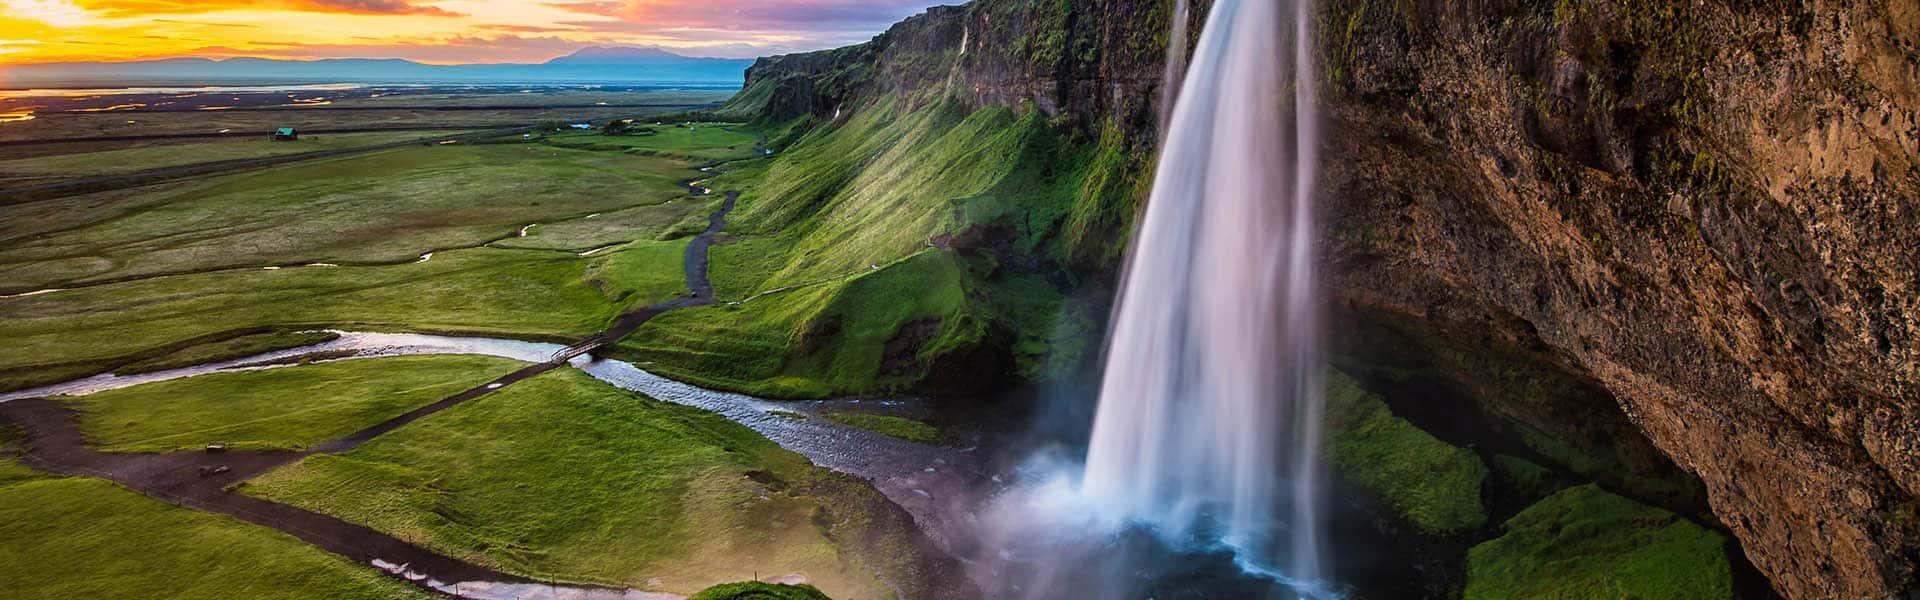 Transatlantique : Écosse et Islande